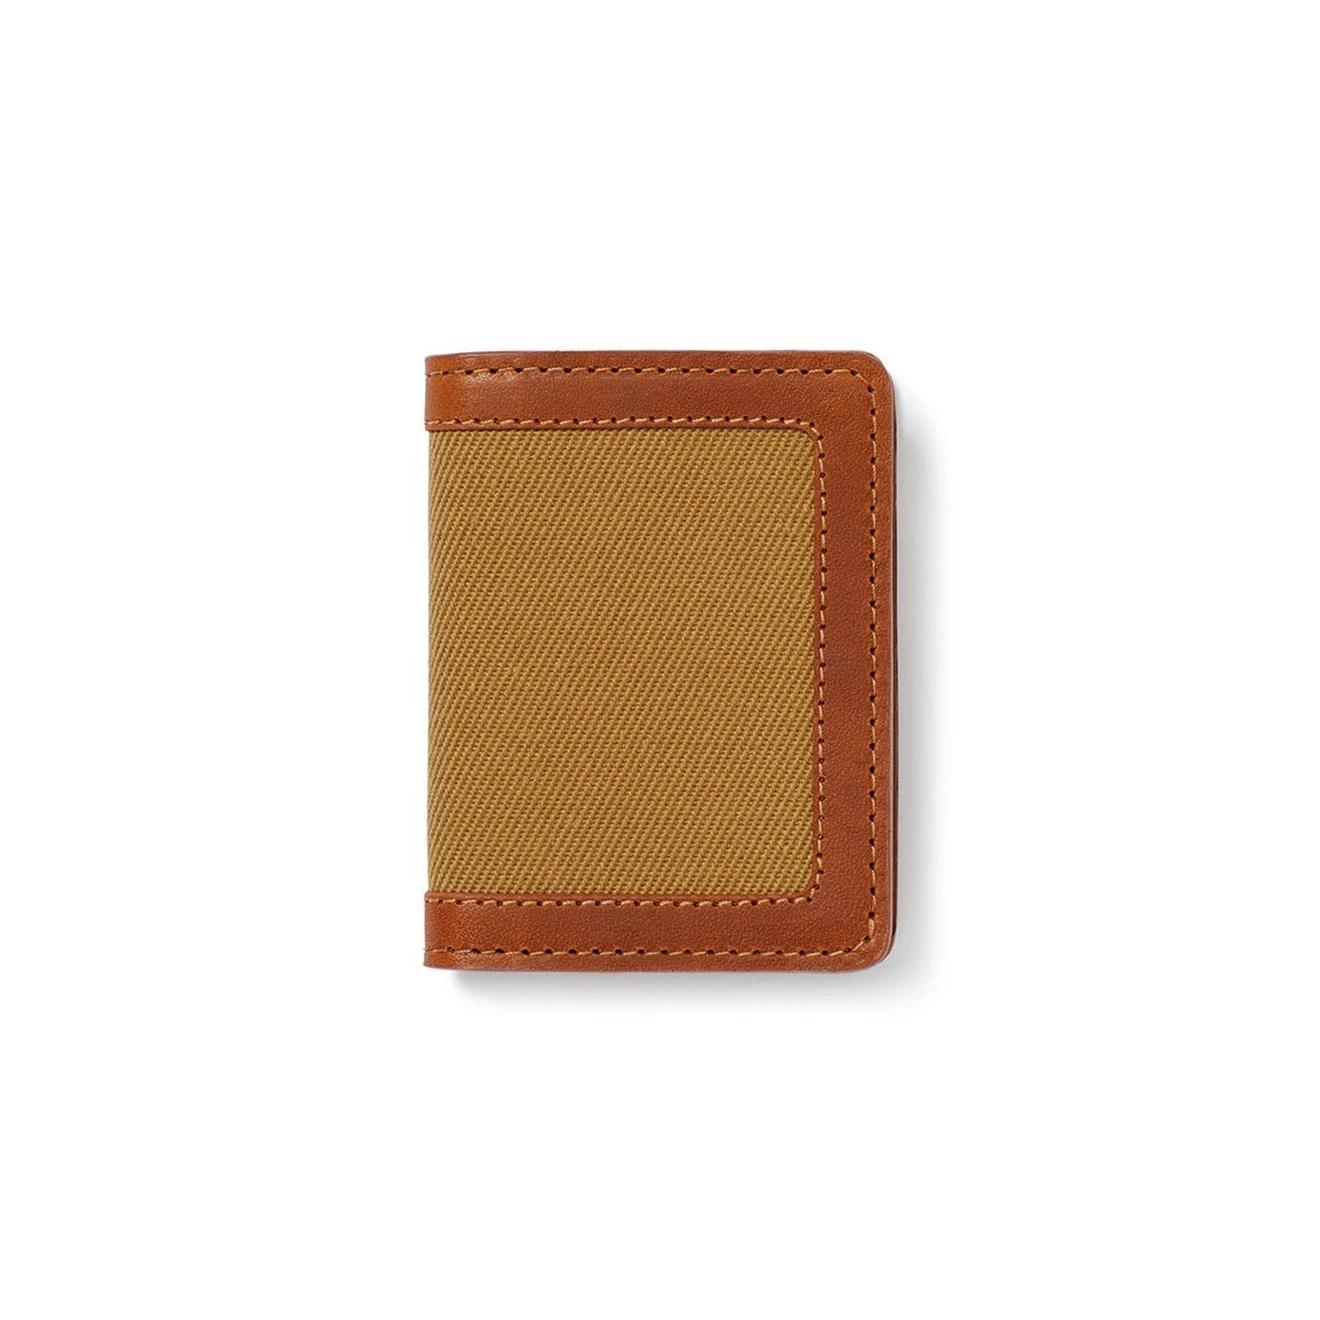 Filson Outfitter Wallet Tan